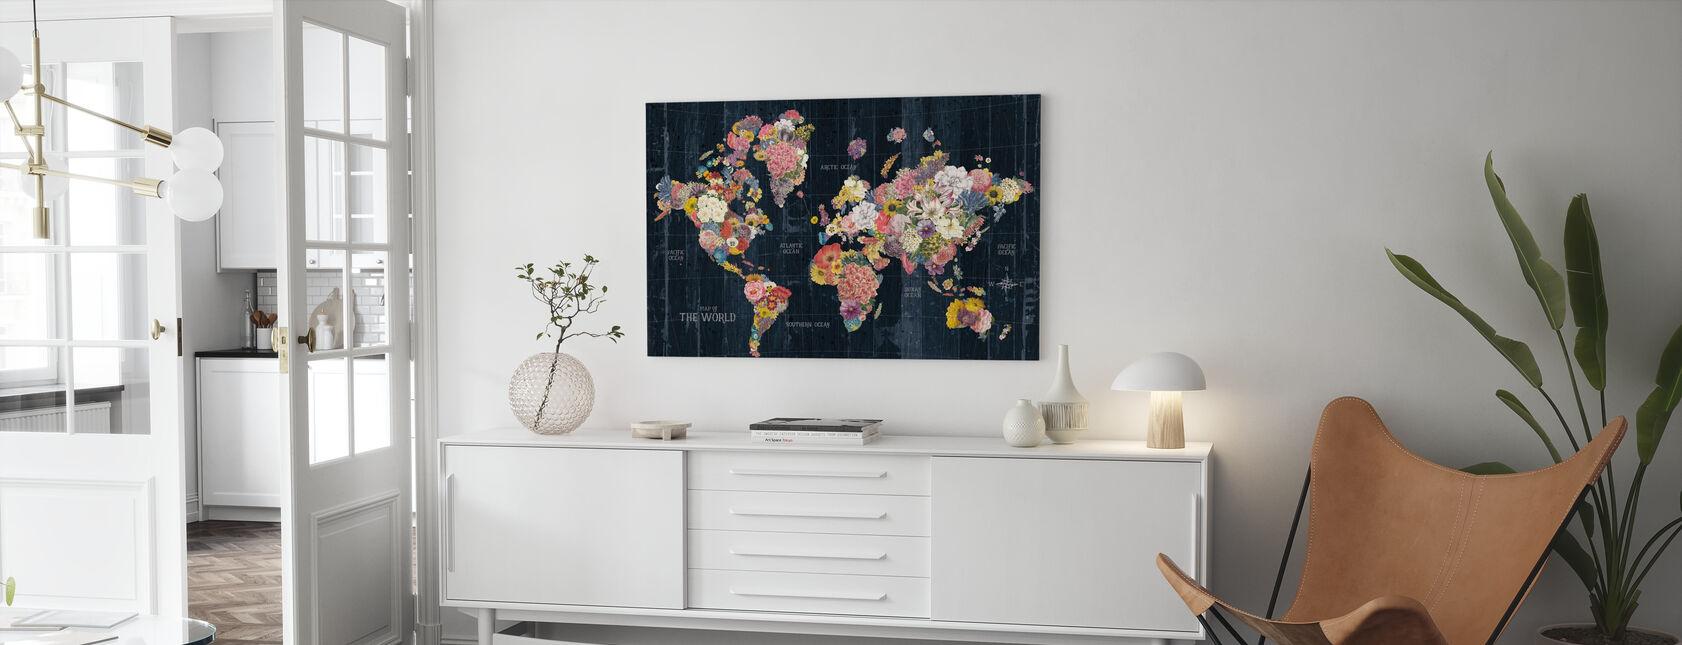 Botanical Floral Map Words - Canvas print - Living Room